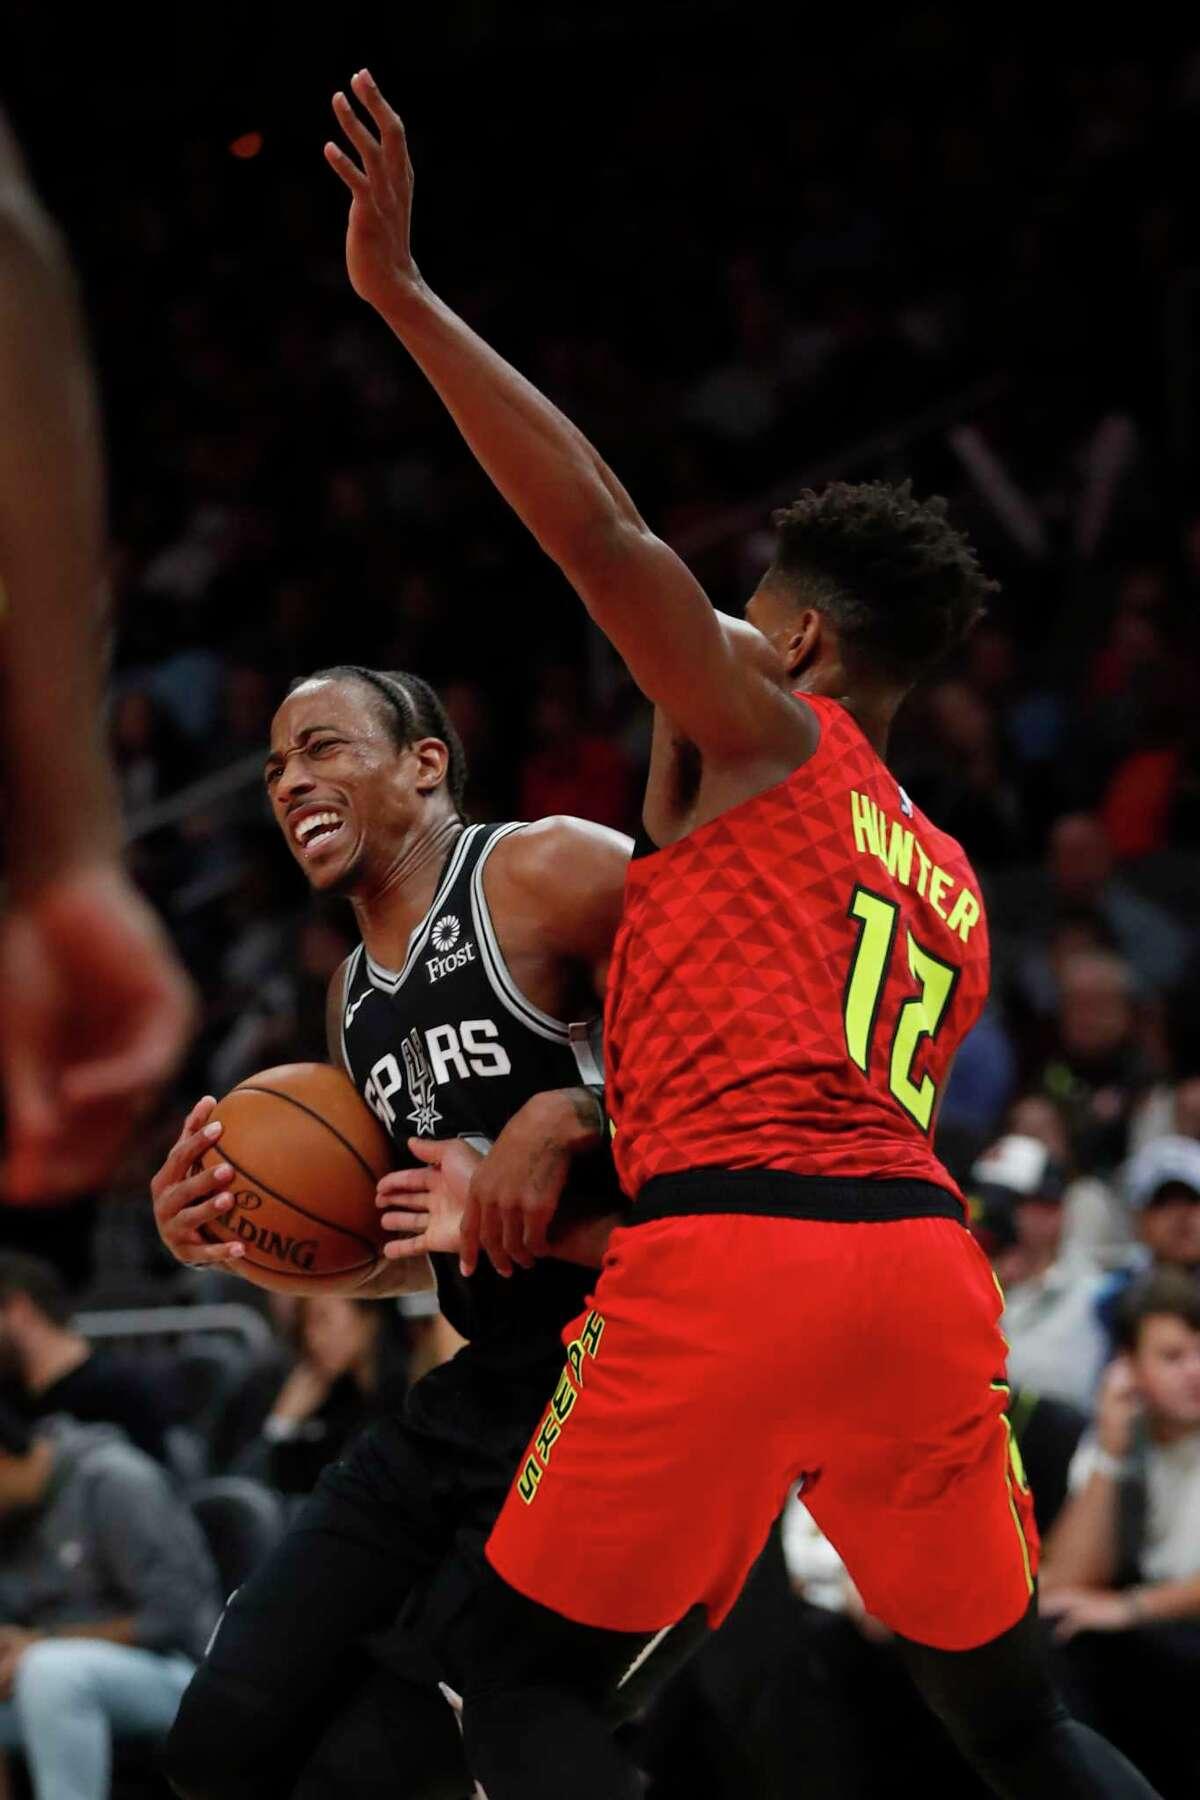 San Antonio Spurs forward DeMar DeRozan (10) drives against Atlanta Hawks forward De'Andre Hunter (12) in the first half of an NBA basketball game Tuesday, Nov. 5, 2019, in Atlanta. (AP Photo/John Bazemore)